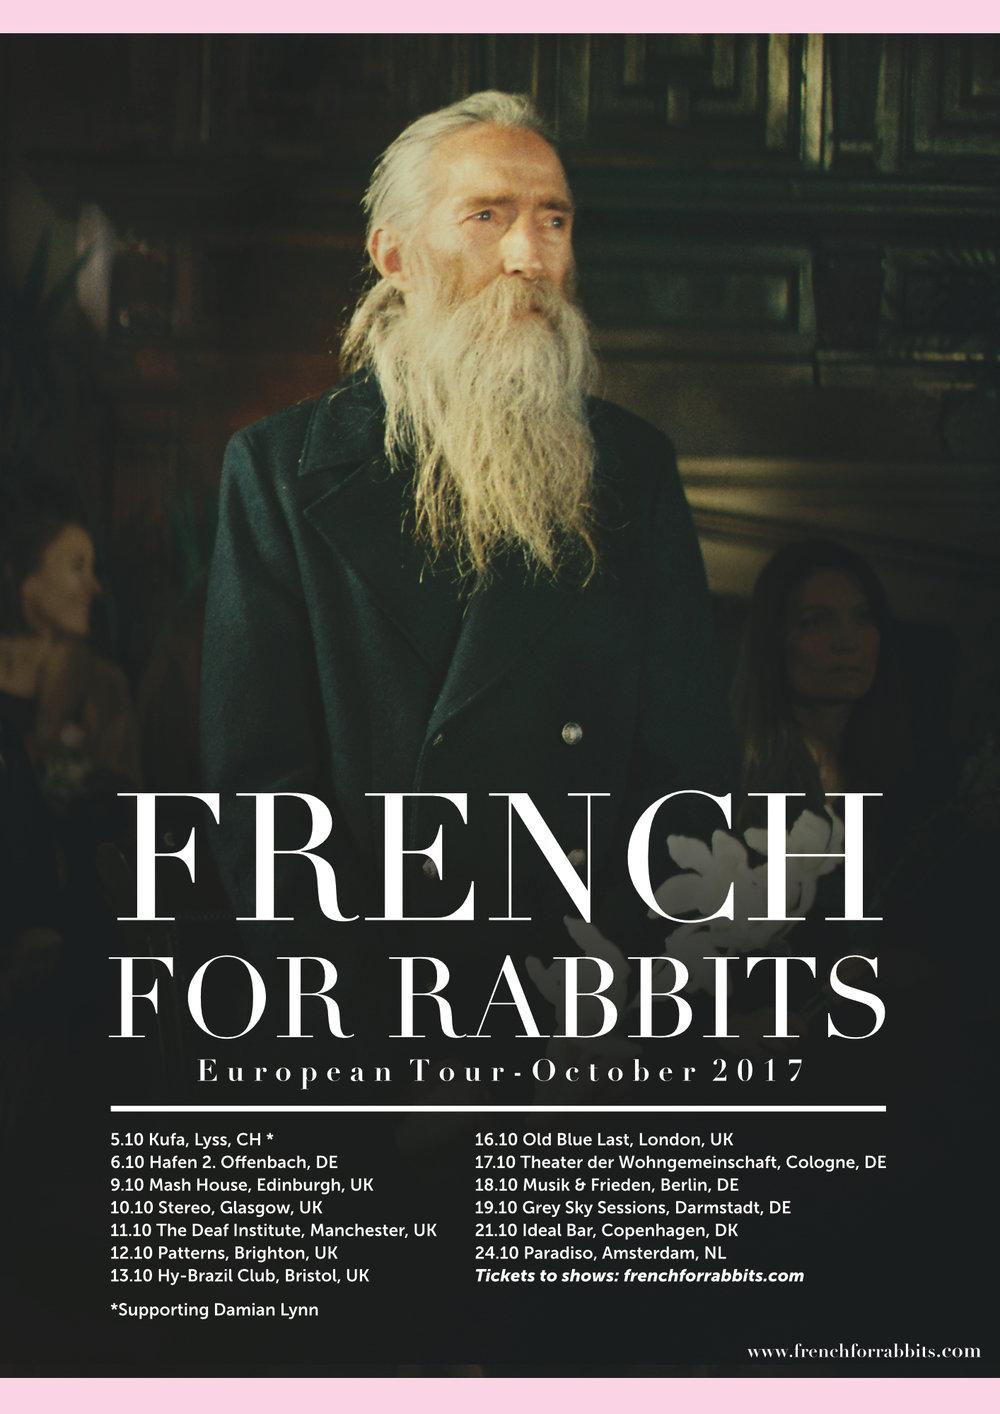 FFR Europe 2017 Poster 1.jpg